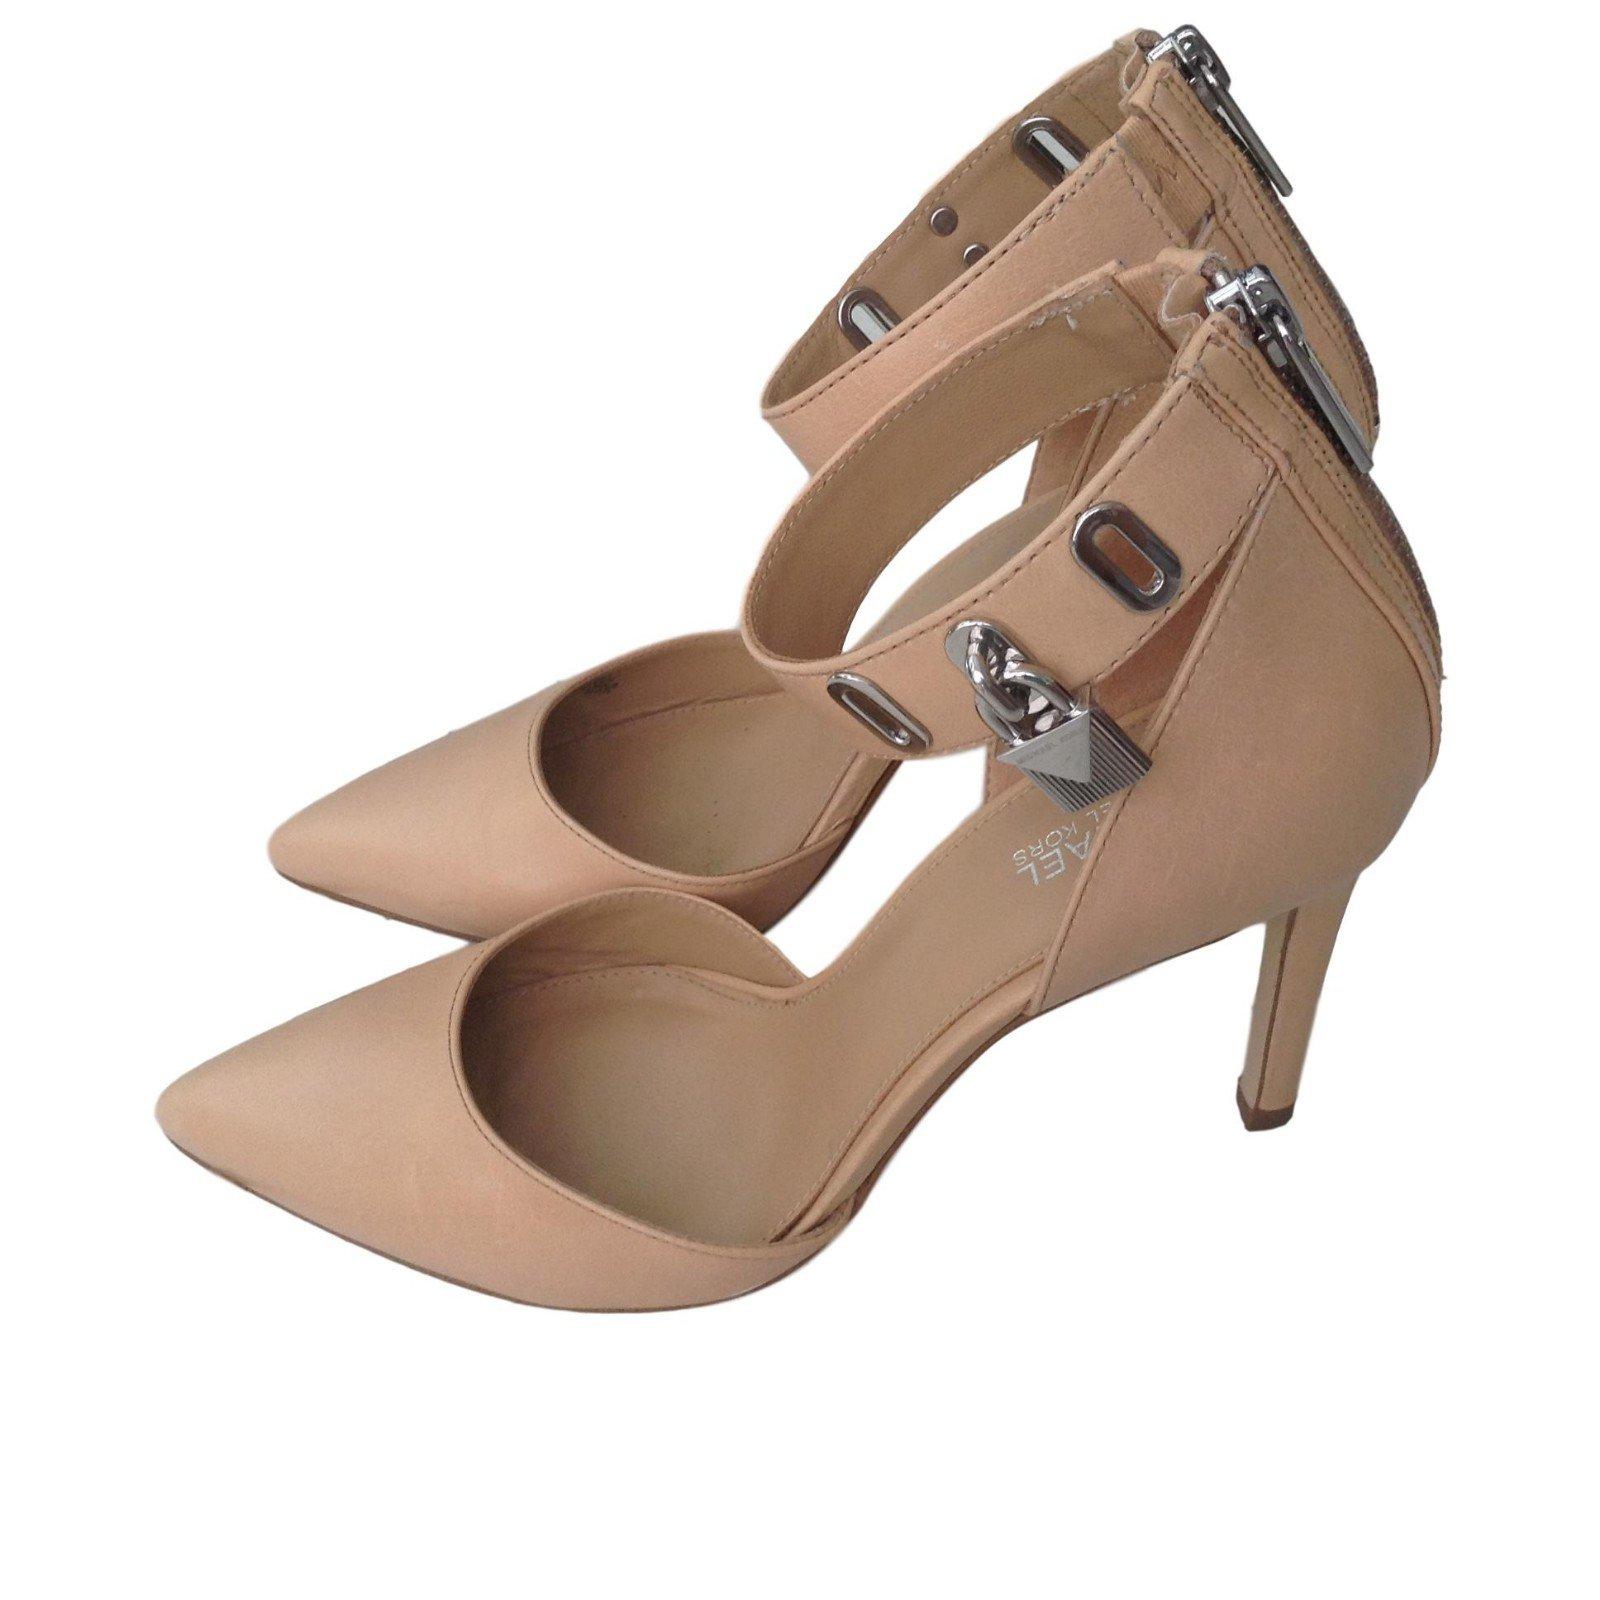 Michael Kors sandals Heels Leather